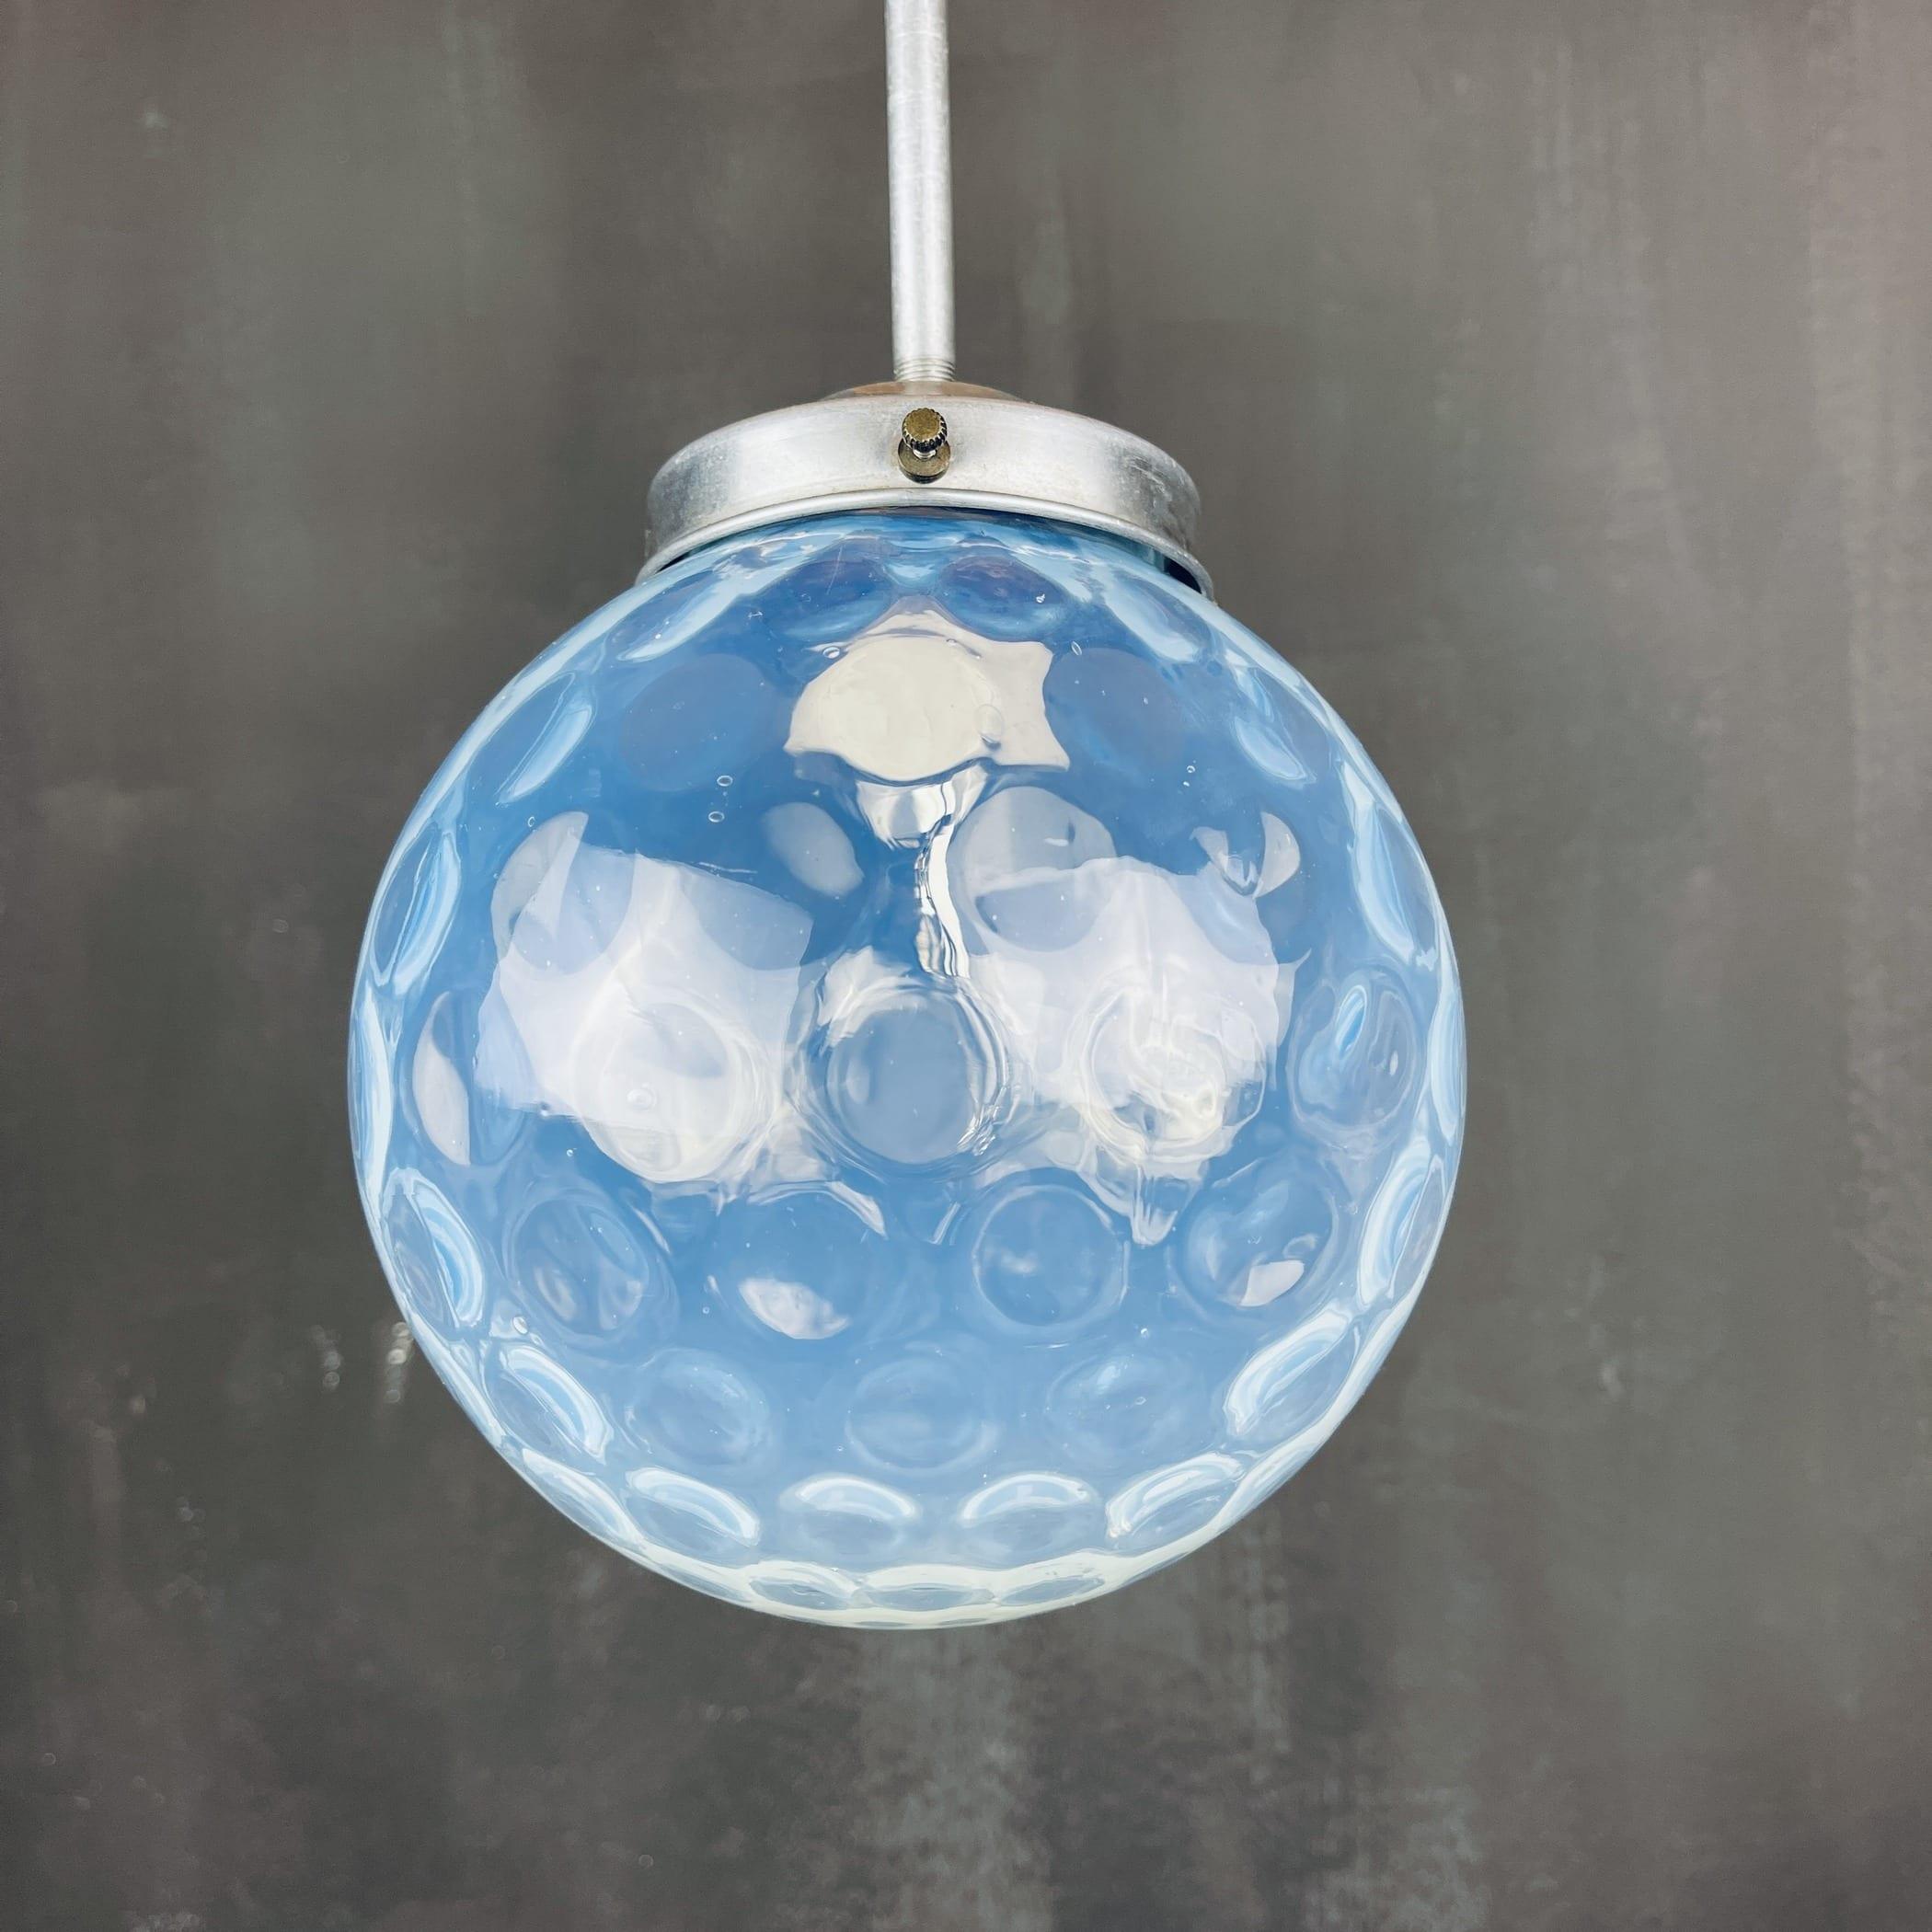 Vintage blue sphere ball pendant lamp Italy 1960s Mid-century italian lighting